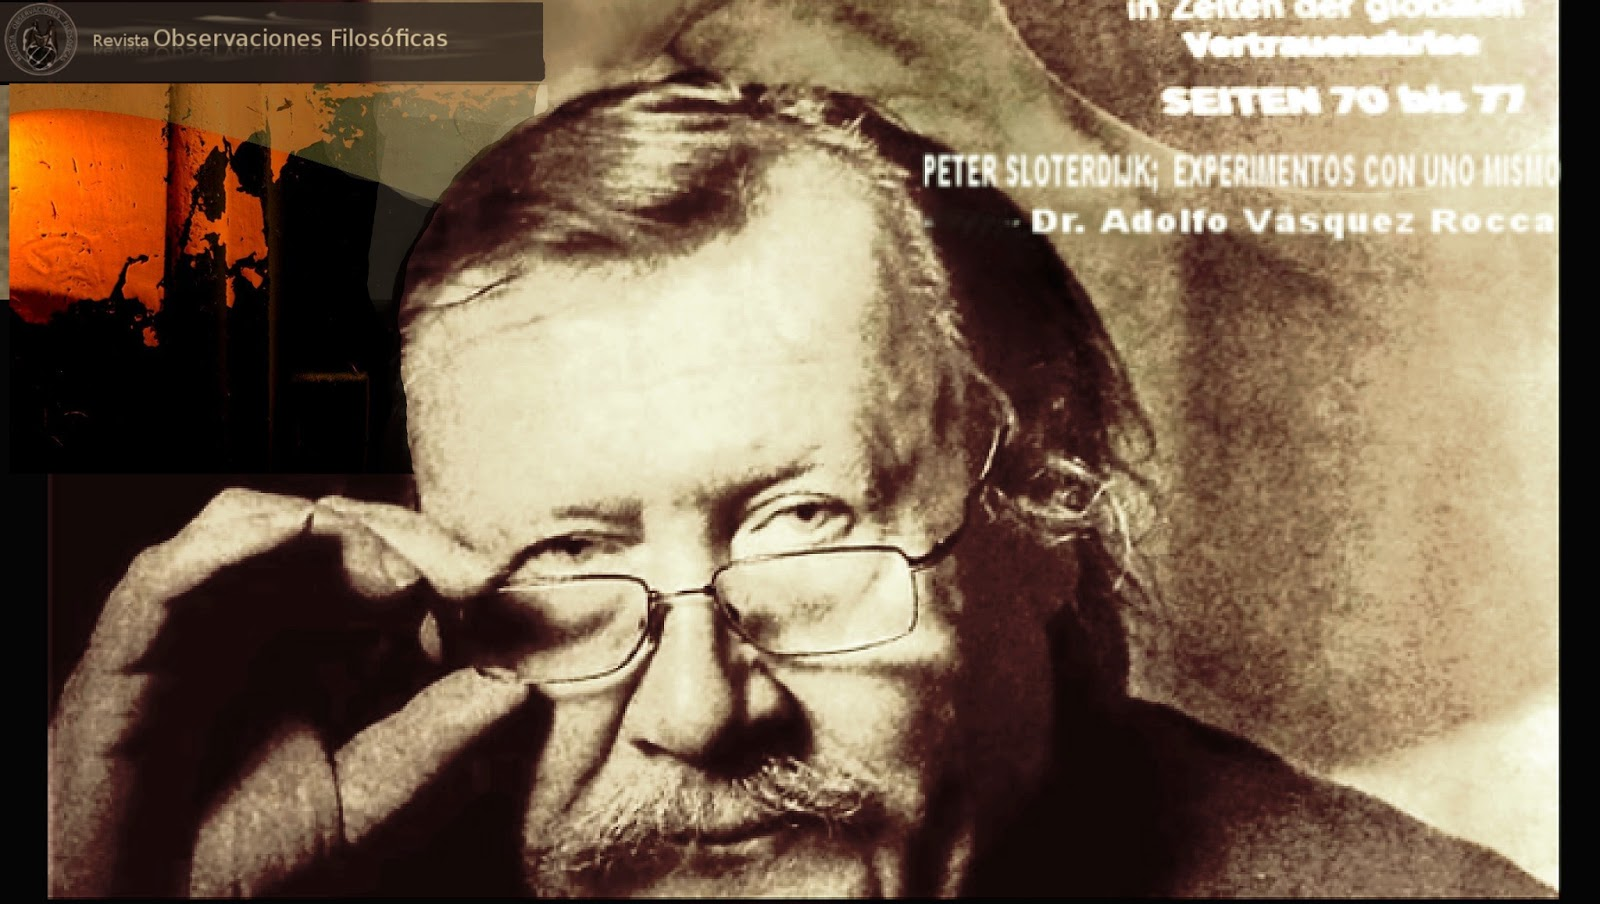 http://4.bp.blogspot.com/-qNfX5jWjtwE/UdzA10JJl5I/AAAAAAAAIr0/vYLWw4Ndqww/s1600/Sloterdijk+Peter+_+Dr.+Adolfo+Vasquez+Rocca+_+Revista+Observaciones+Filos%C3%B3ficas+Archivo+SLOTERDIJK.jpeg